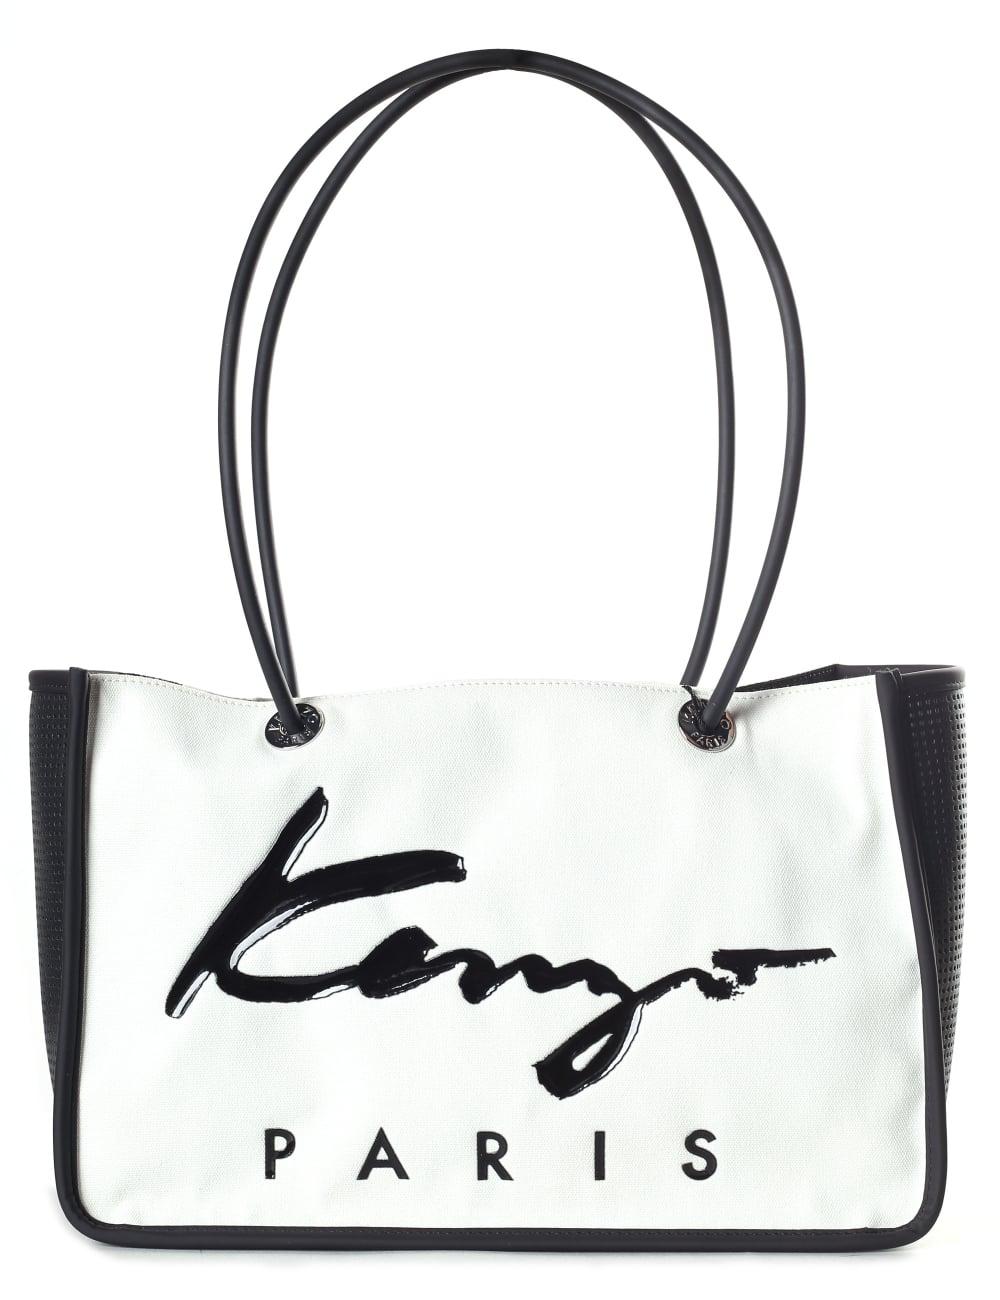 48fc591195a Kenzo Women's Small Tote Bag White